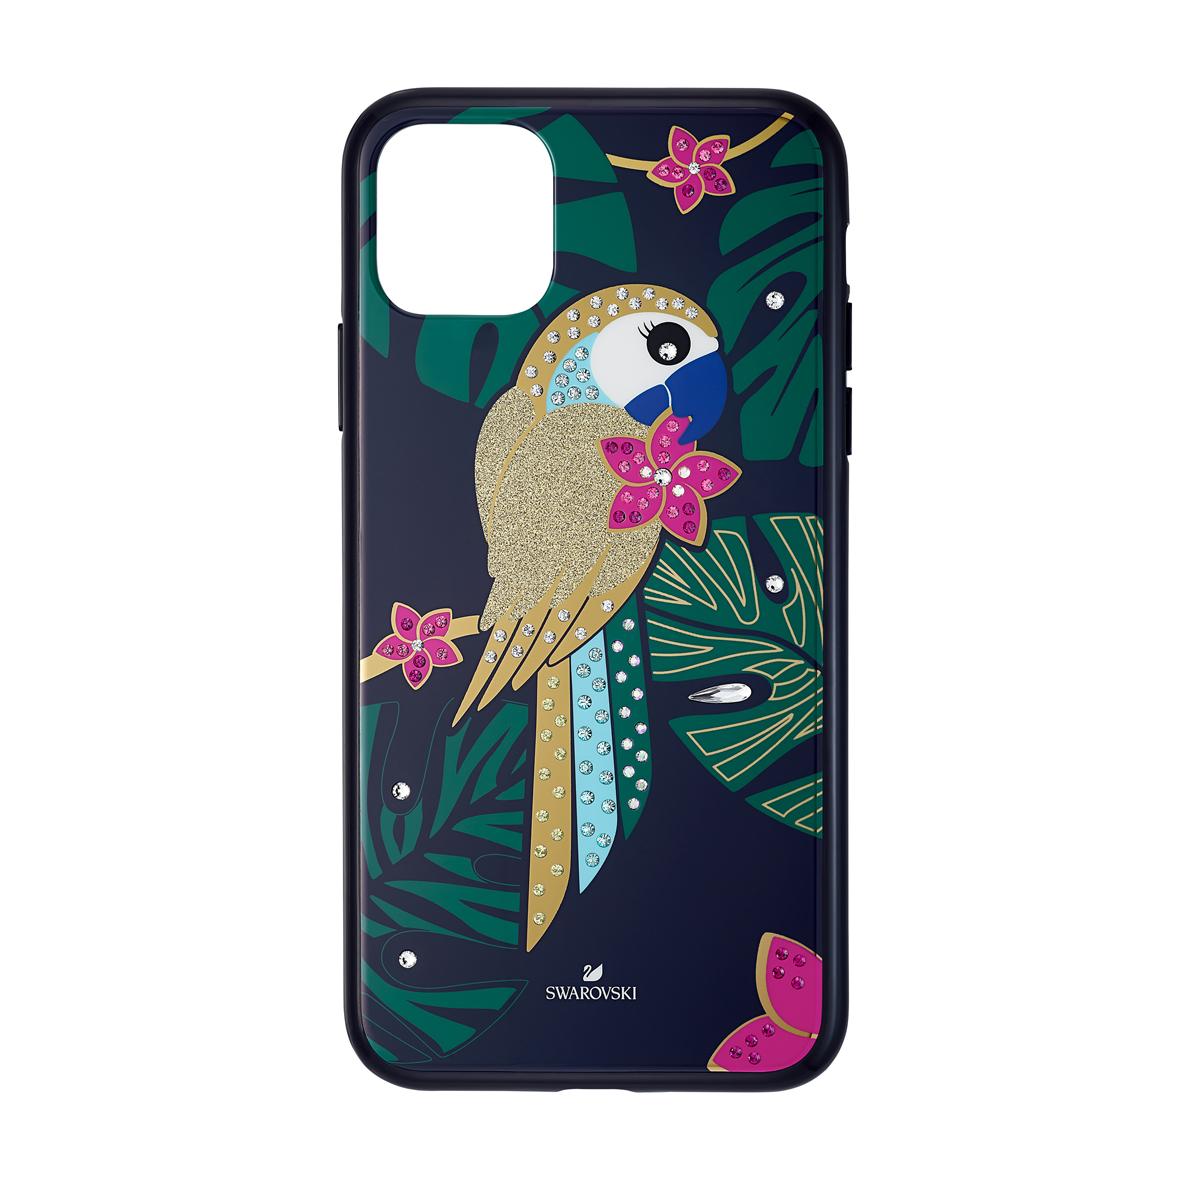 Swarovski Mobile Phone Case Tropical iPhone 11 Pro Max Case Multi Parrot